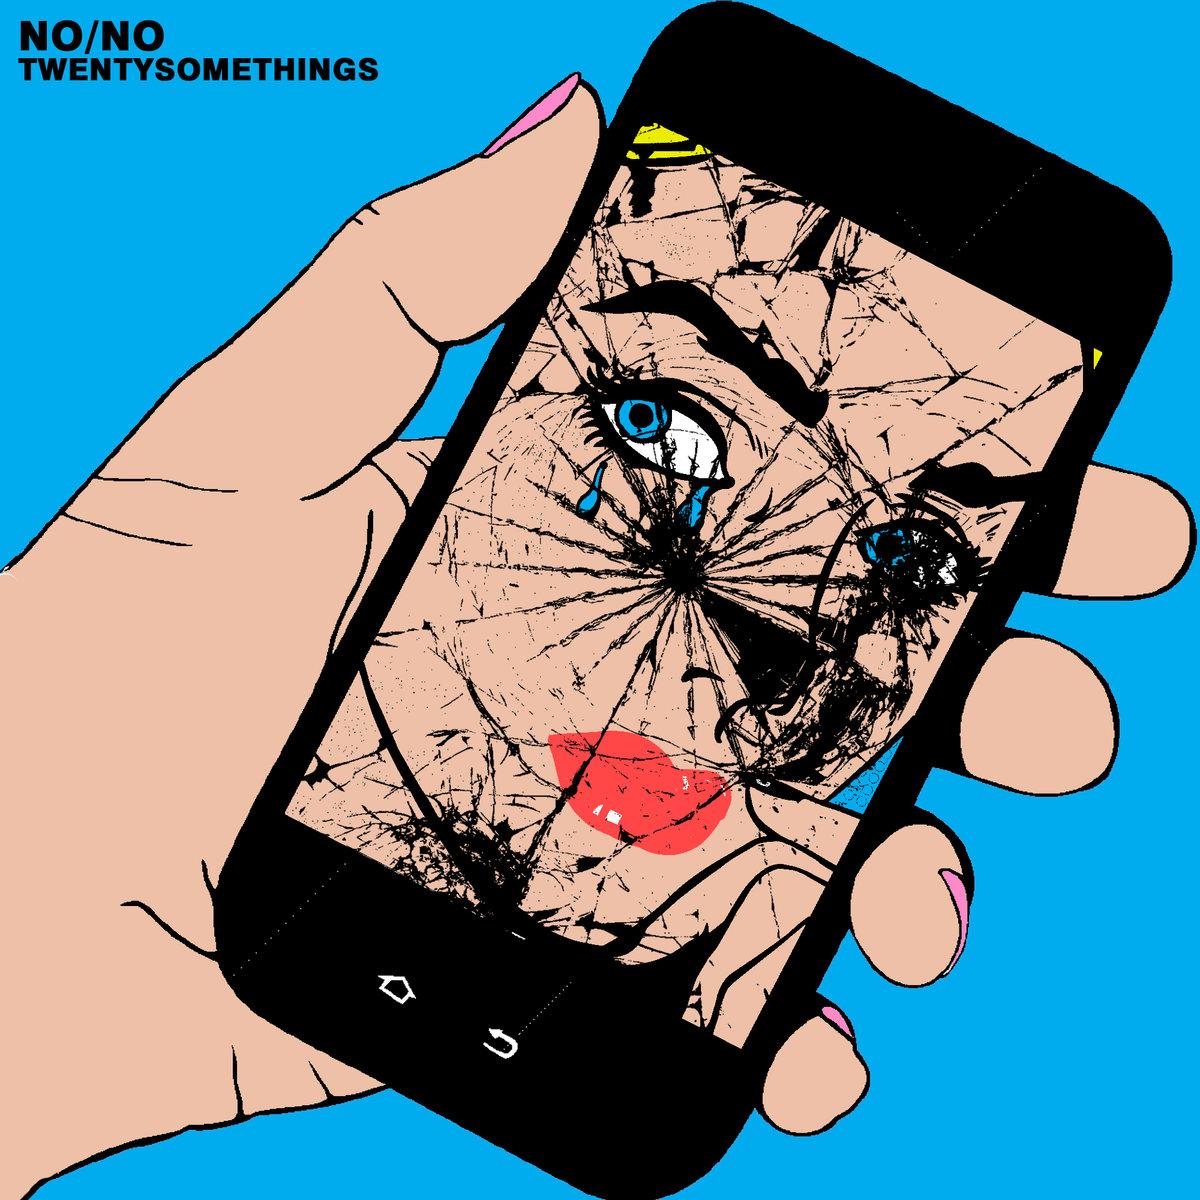 GLS028 - NO/NO - Twentysomethings EP